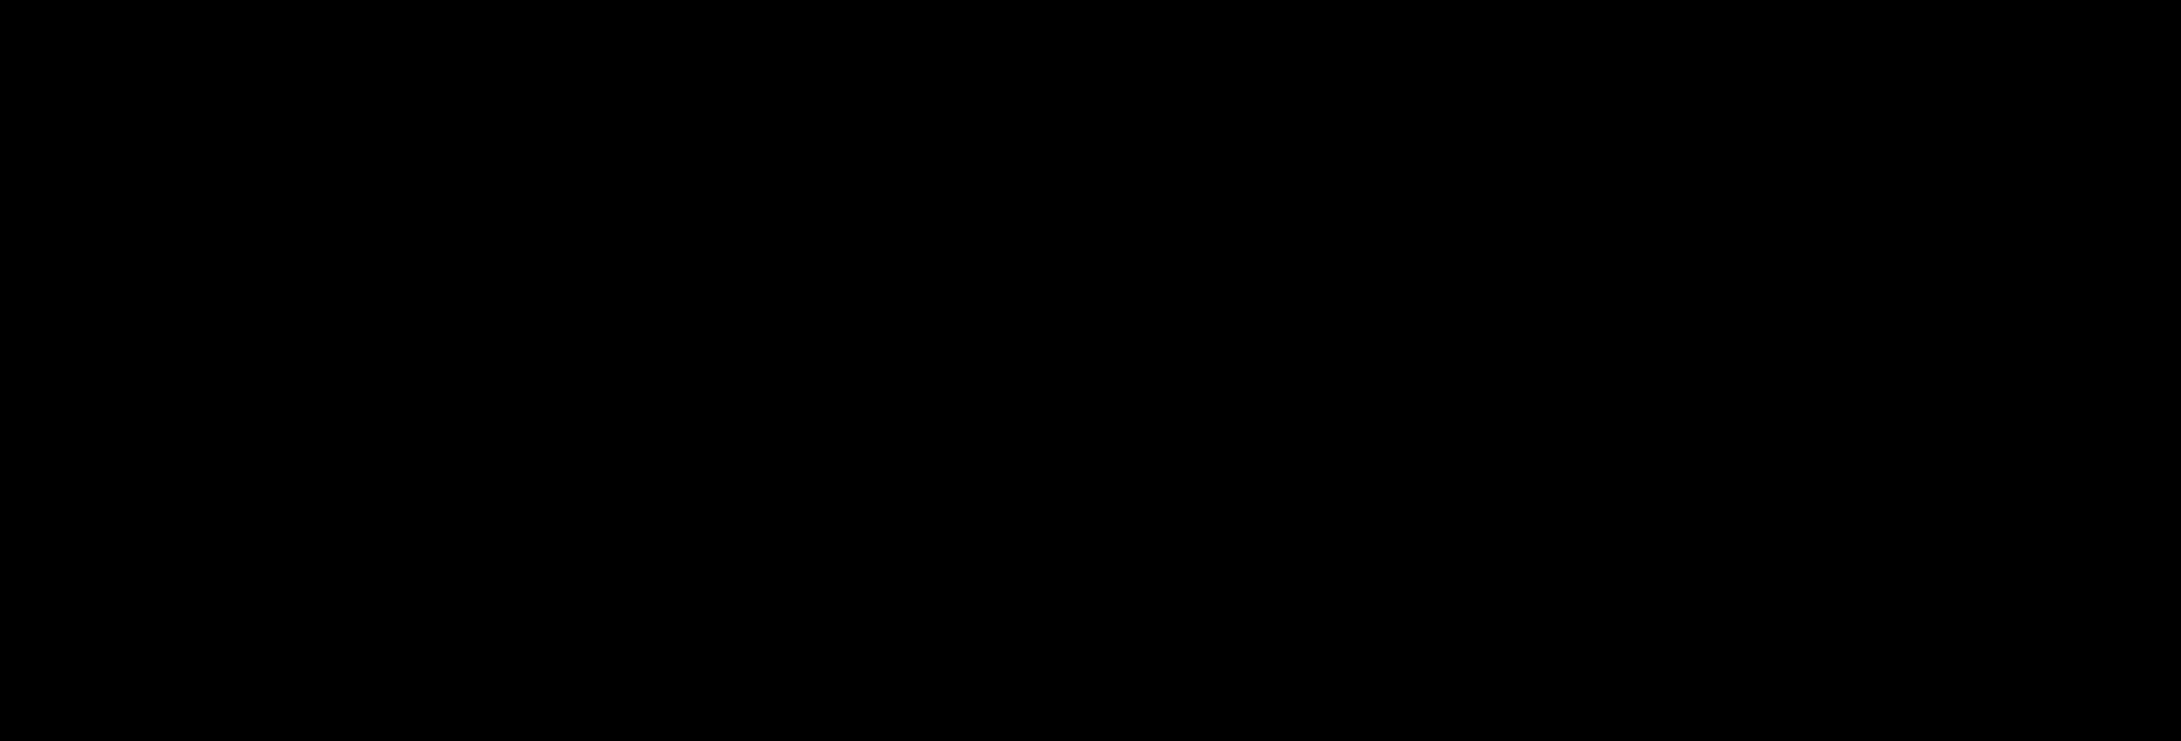 paradarter__logo-vektorized-black.png